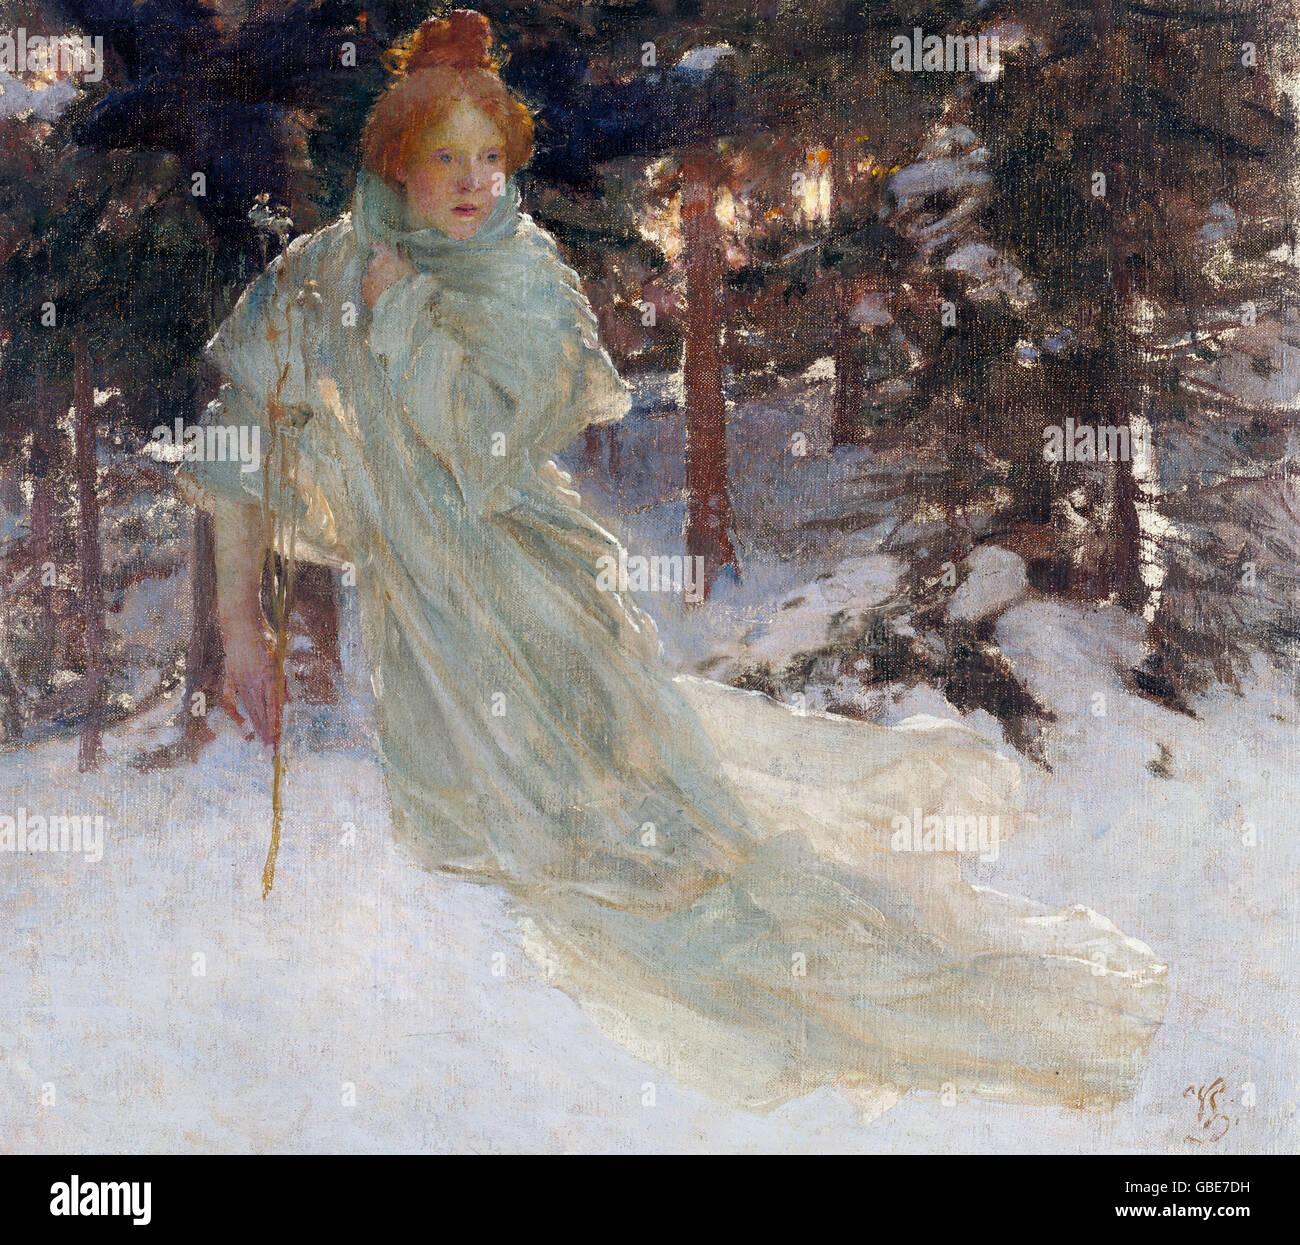 fine arts, Voitech, H. 'Zima' (Winter), painting, National Gallery, Prague, - Stock Image